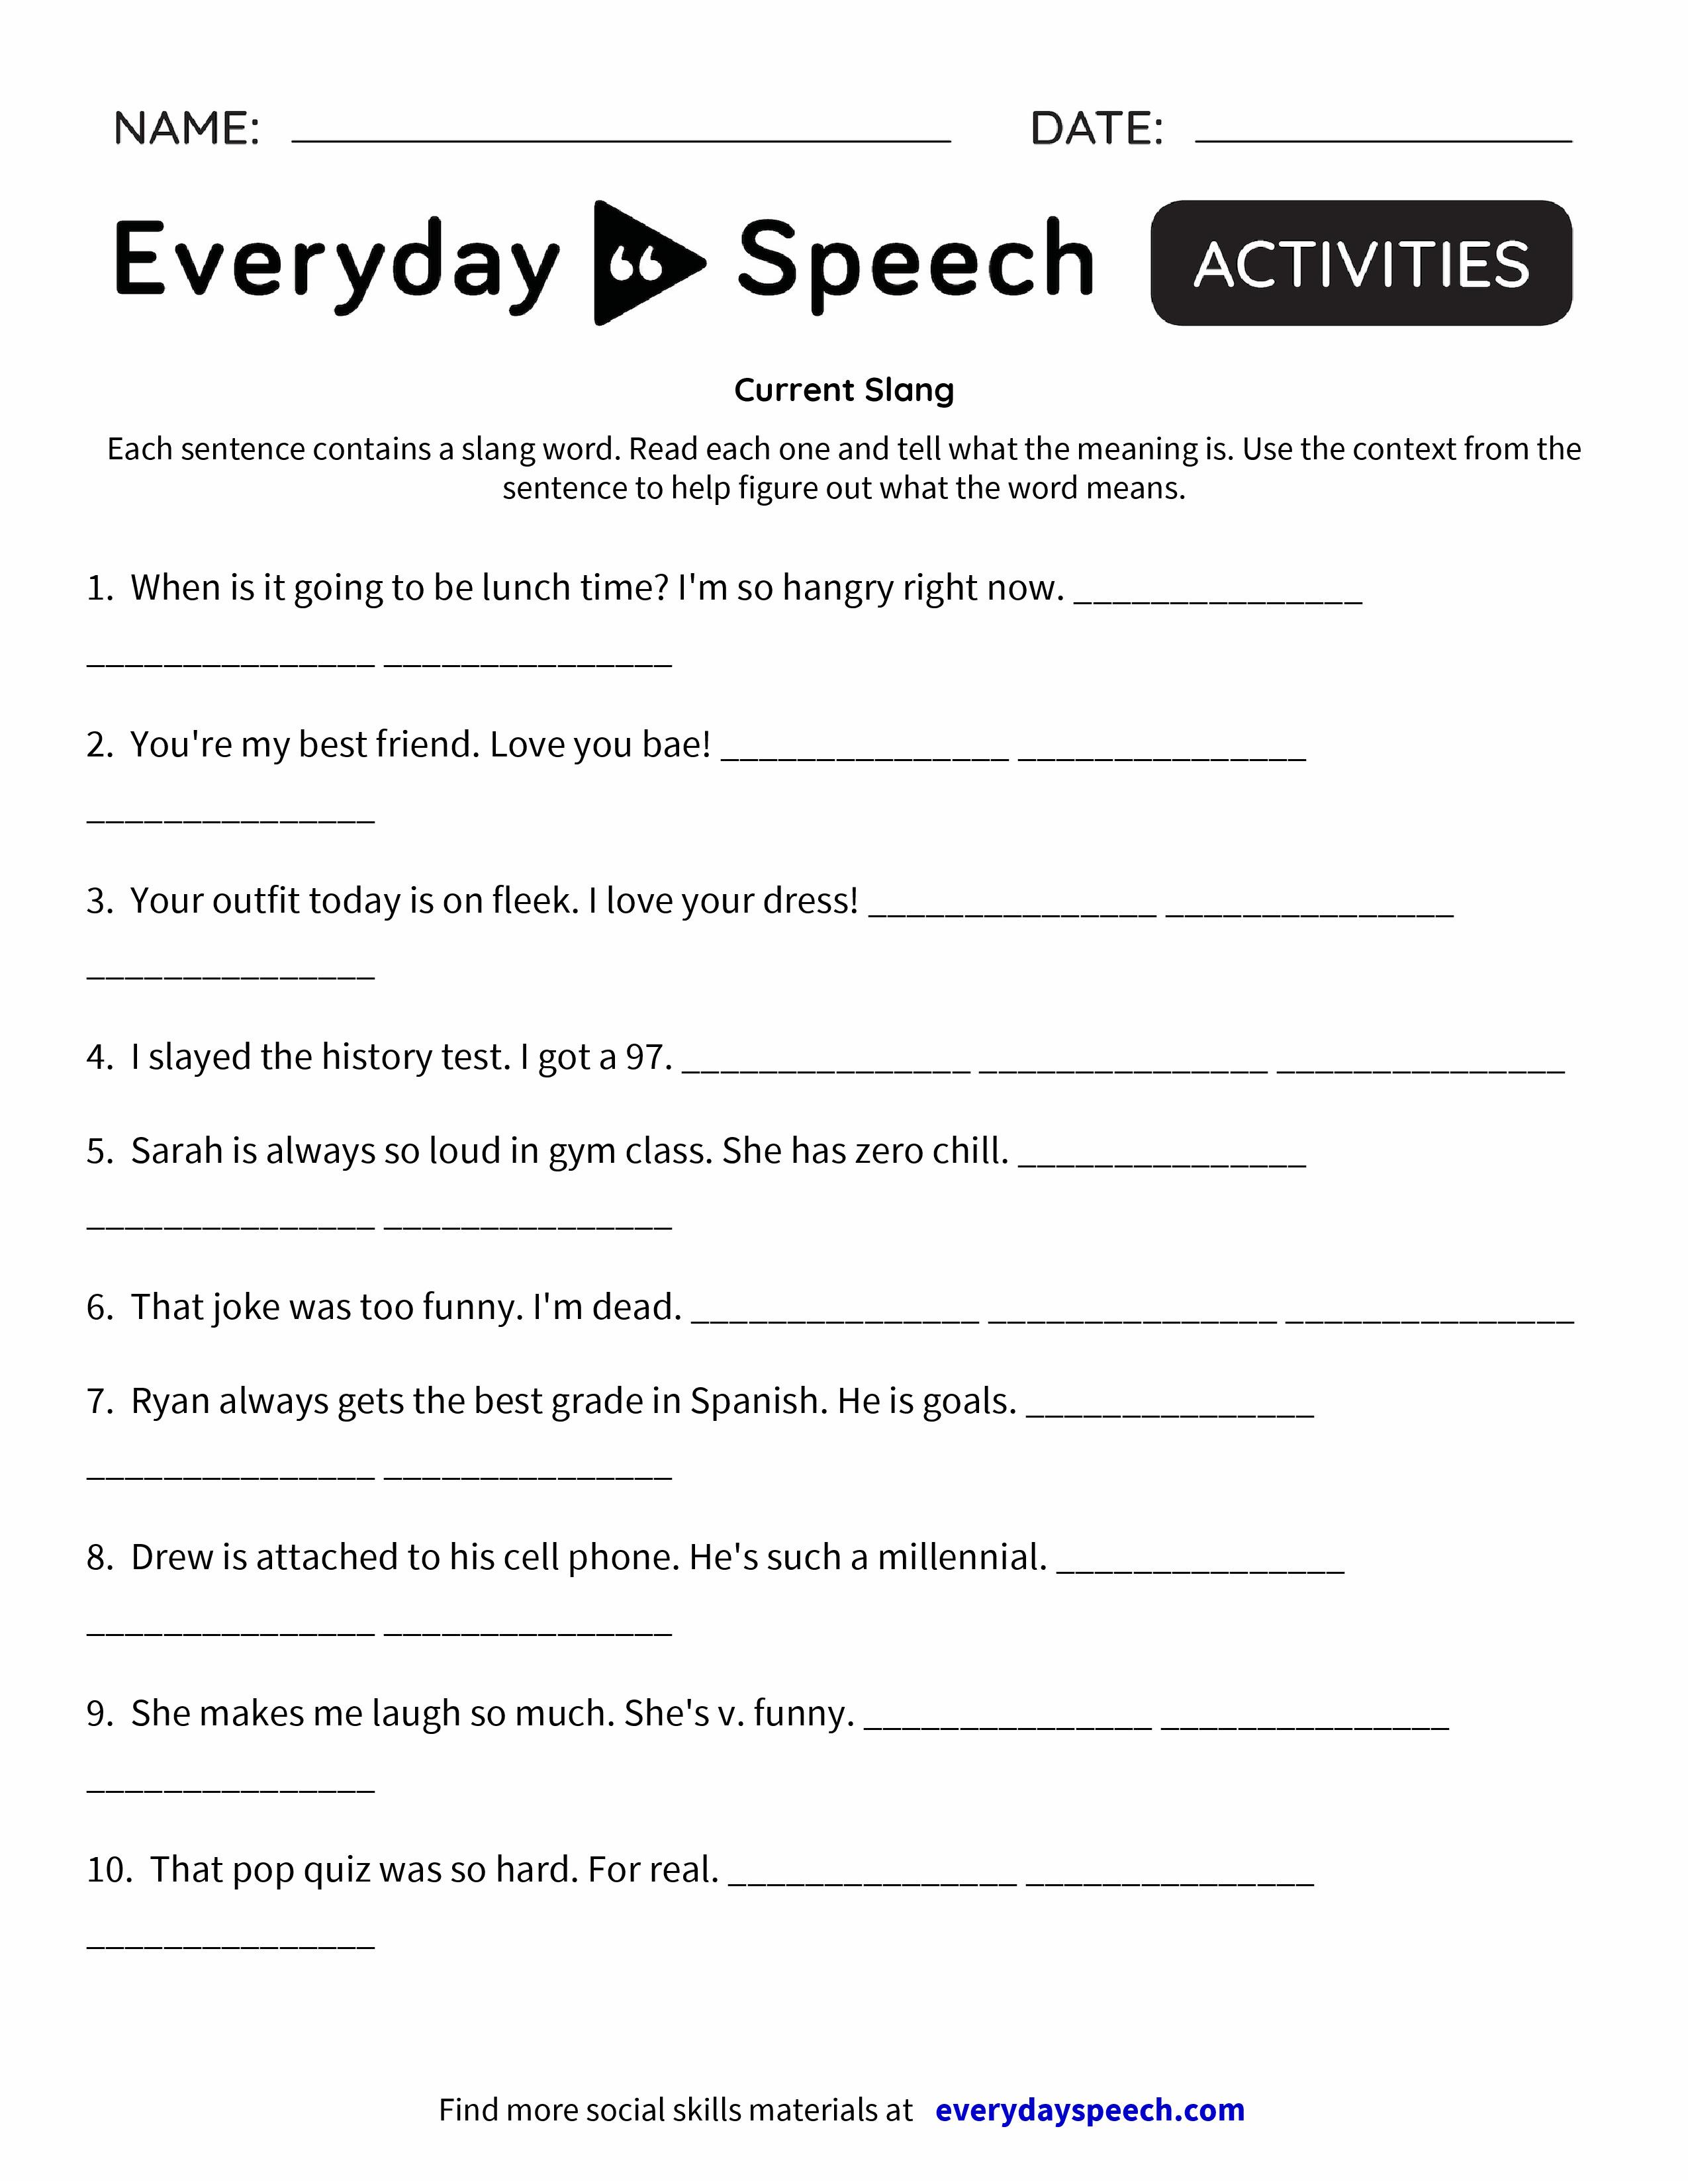 Current Slang - Everyday Speech - Everyday Speech